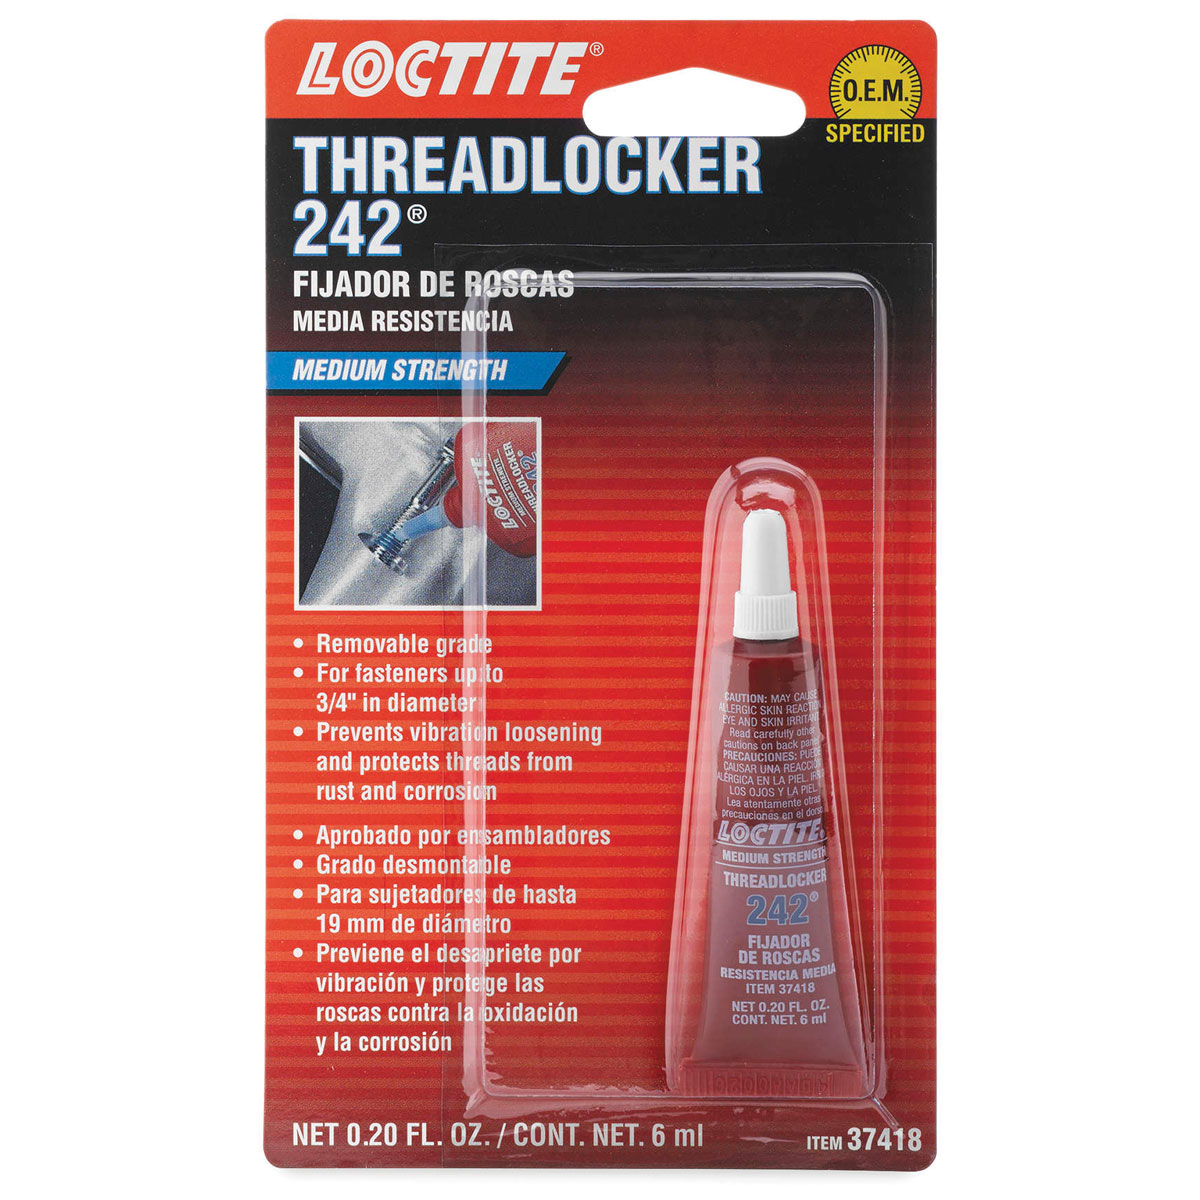 Loctite Blue Threadlocker 242 Medium Strength